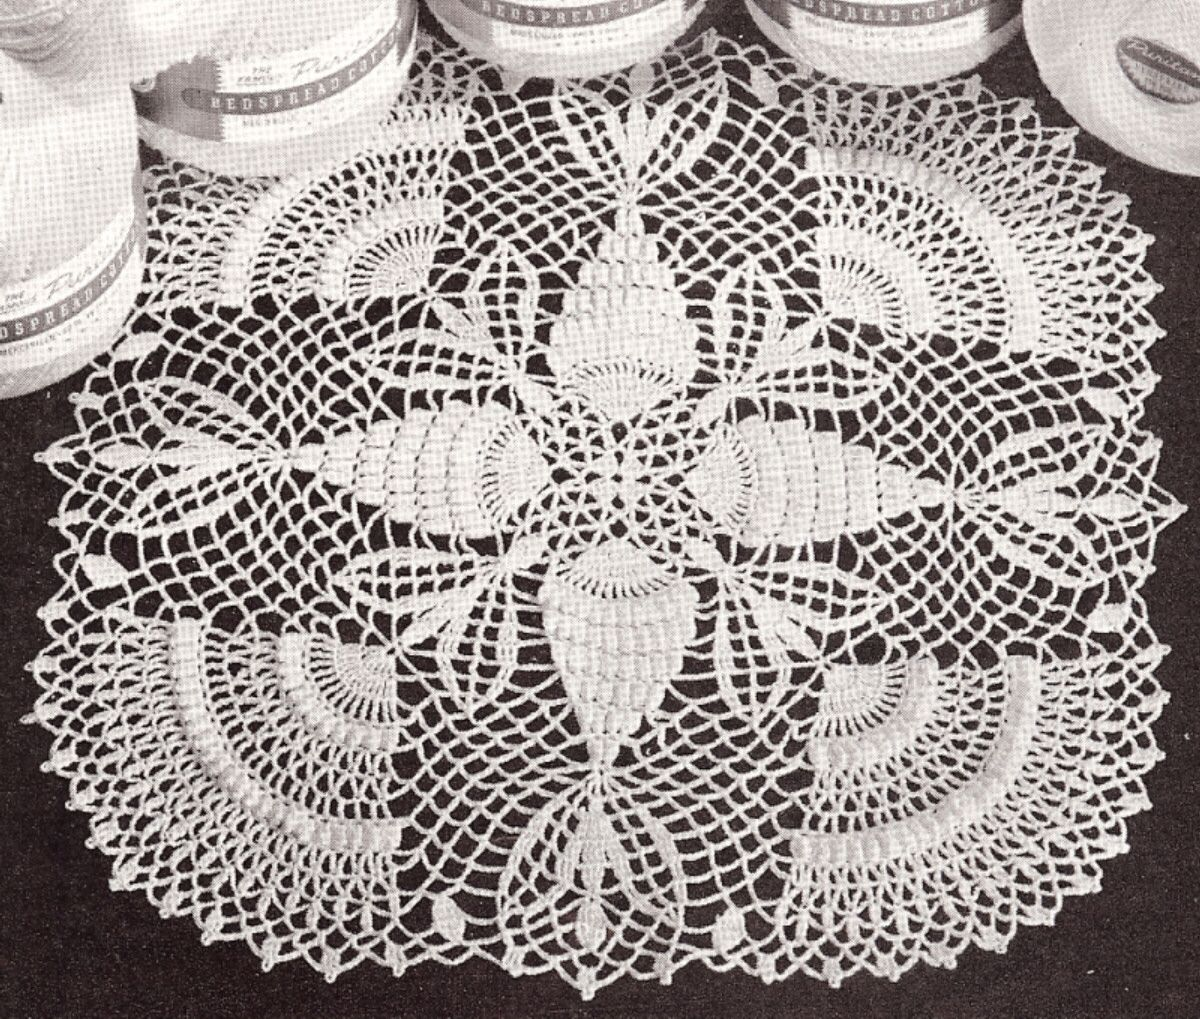 Doily Thread Pineapple Popcorn crochet Pattern | For the Home ...